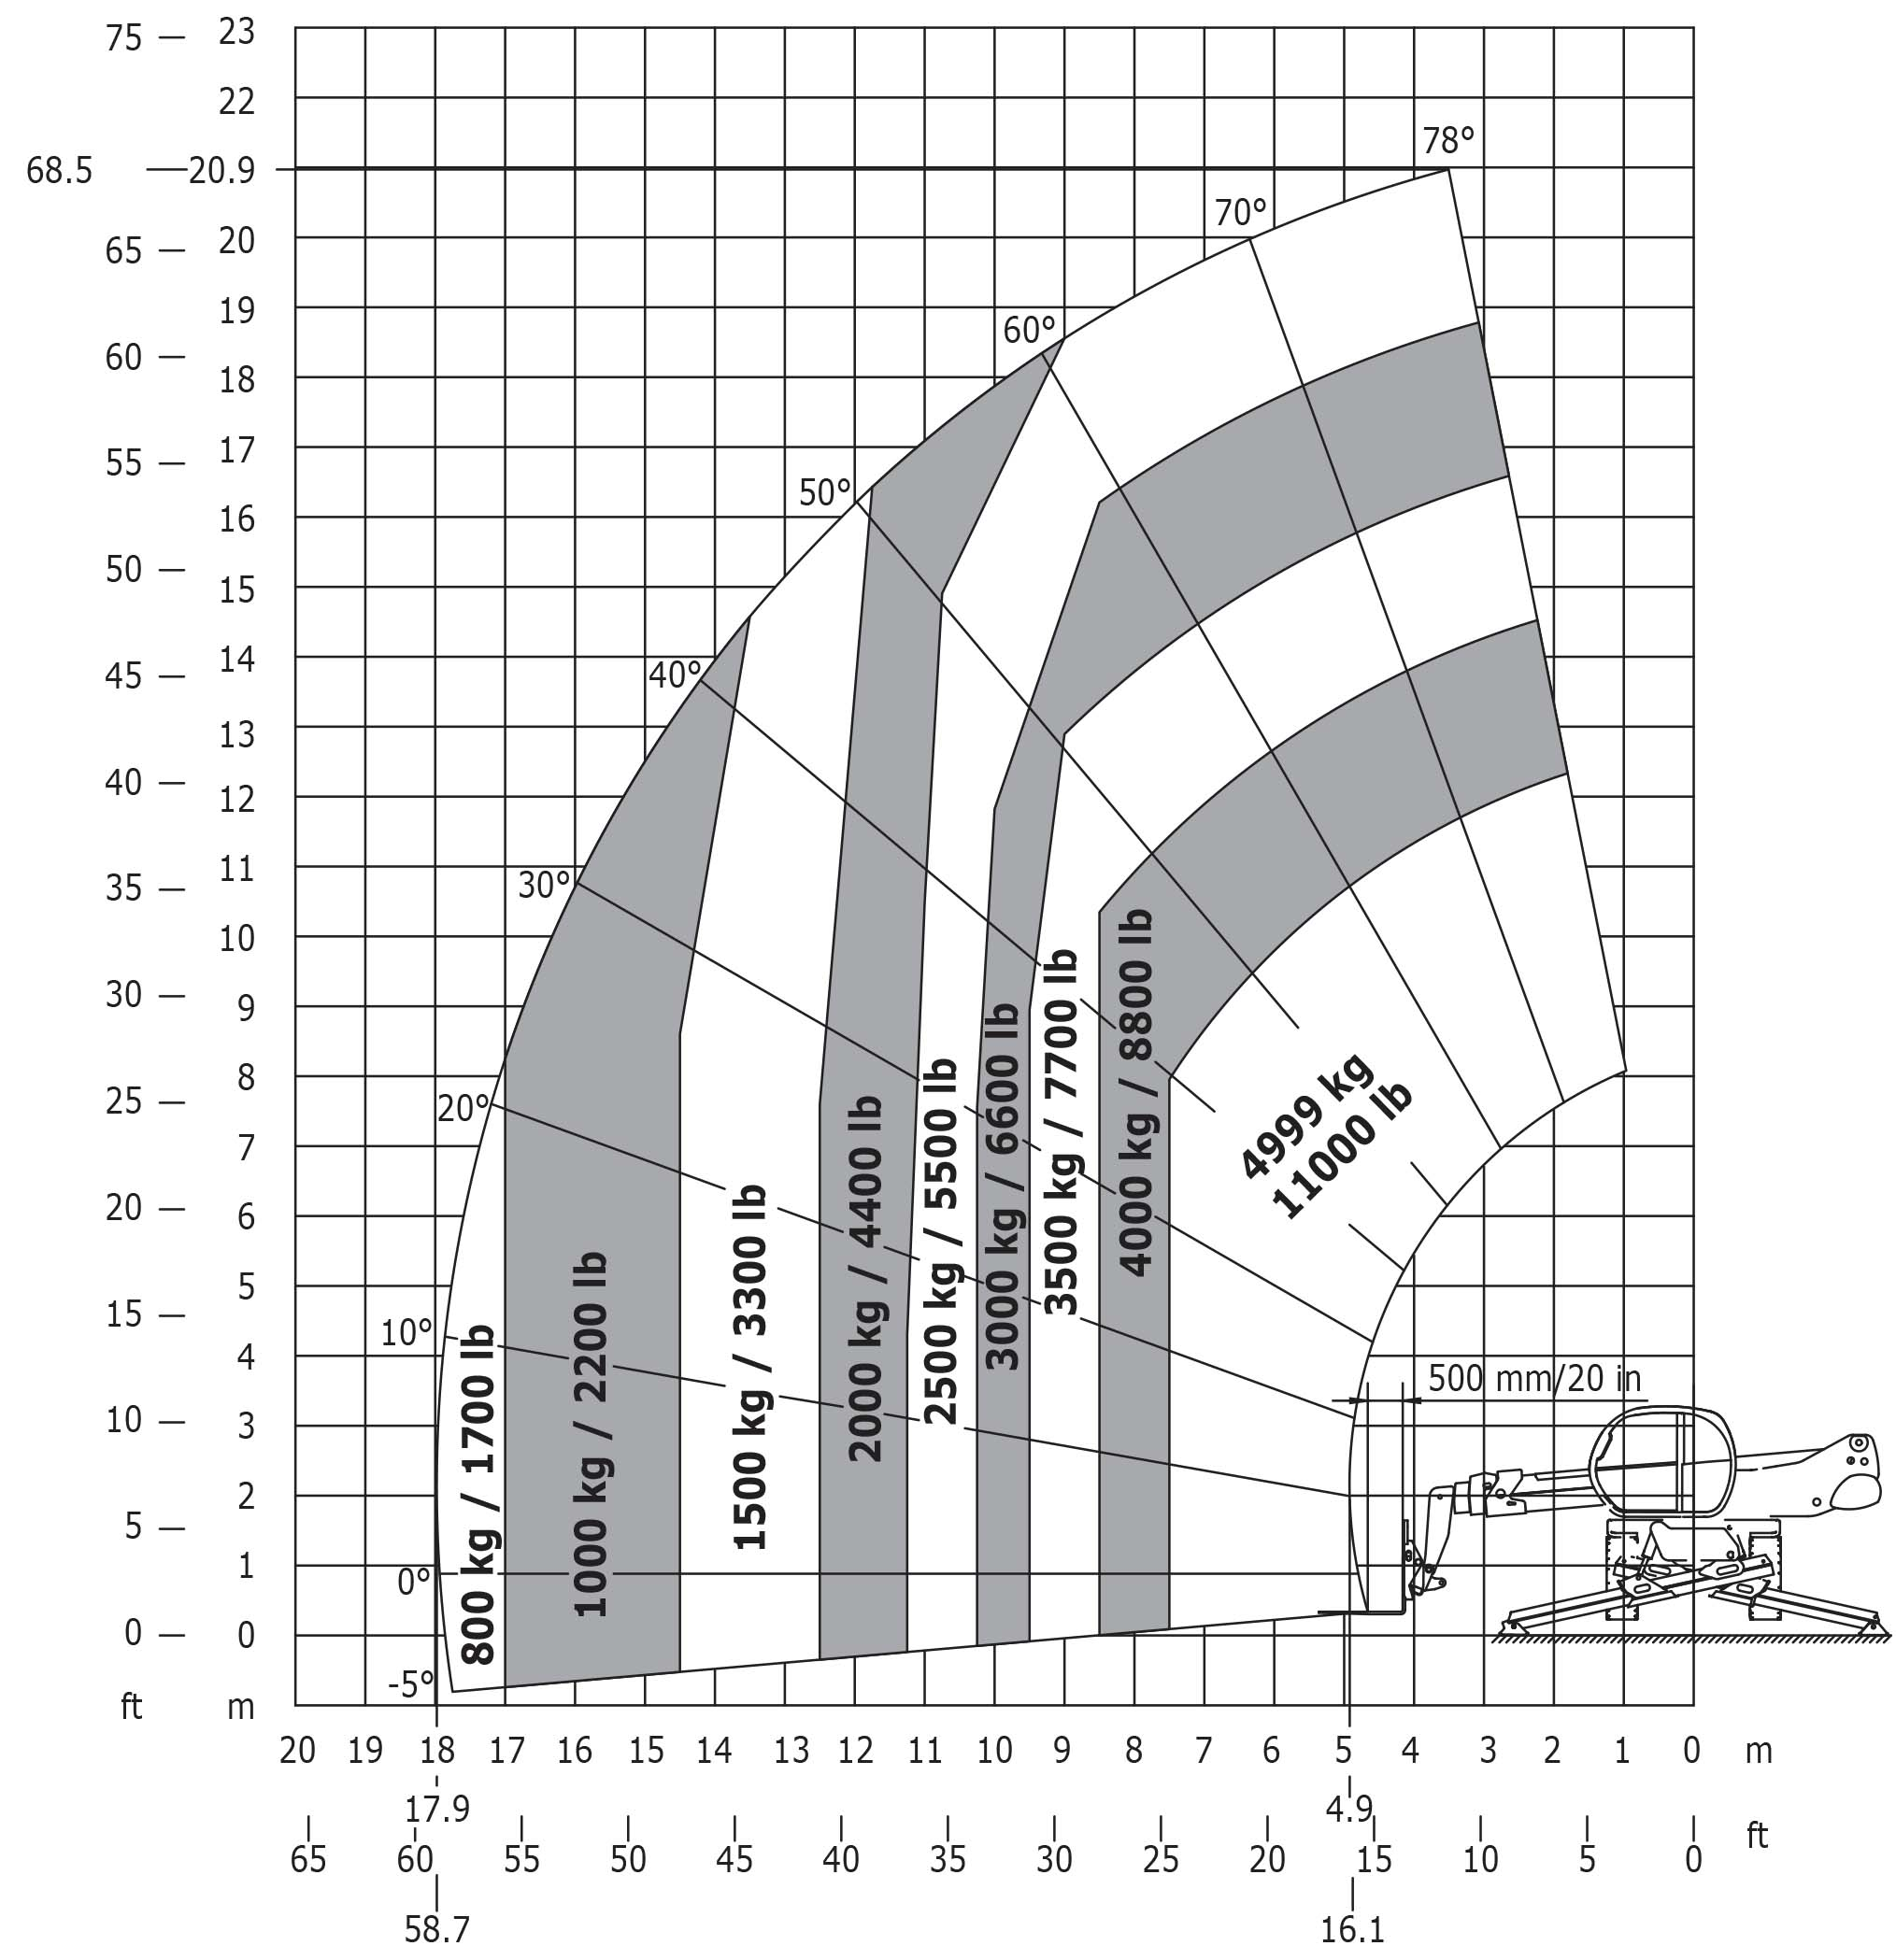 Oz To Lb Conversion Chart